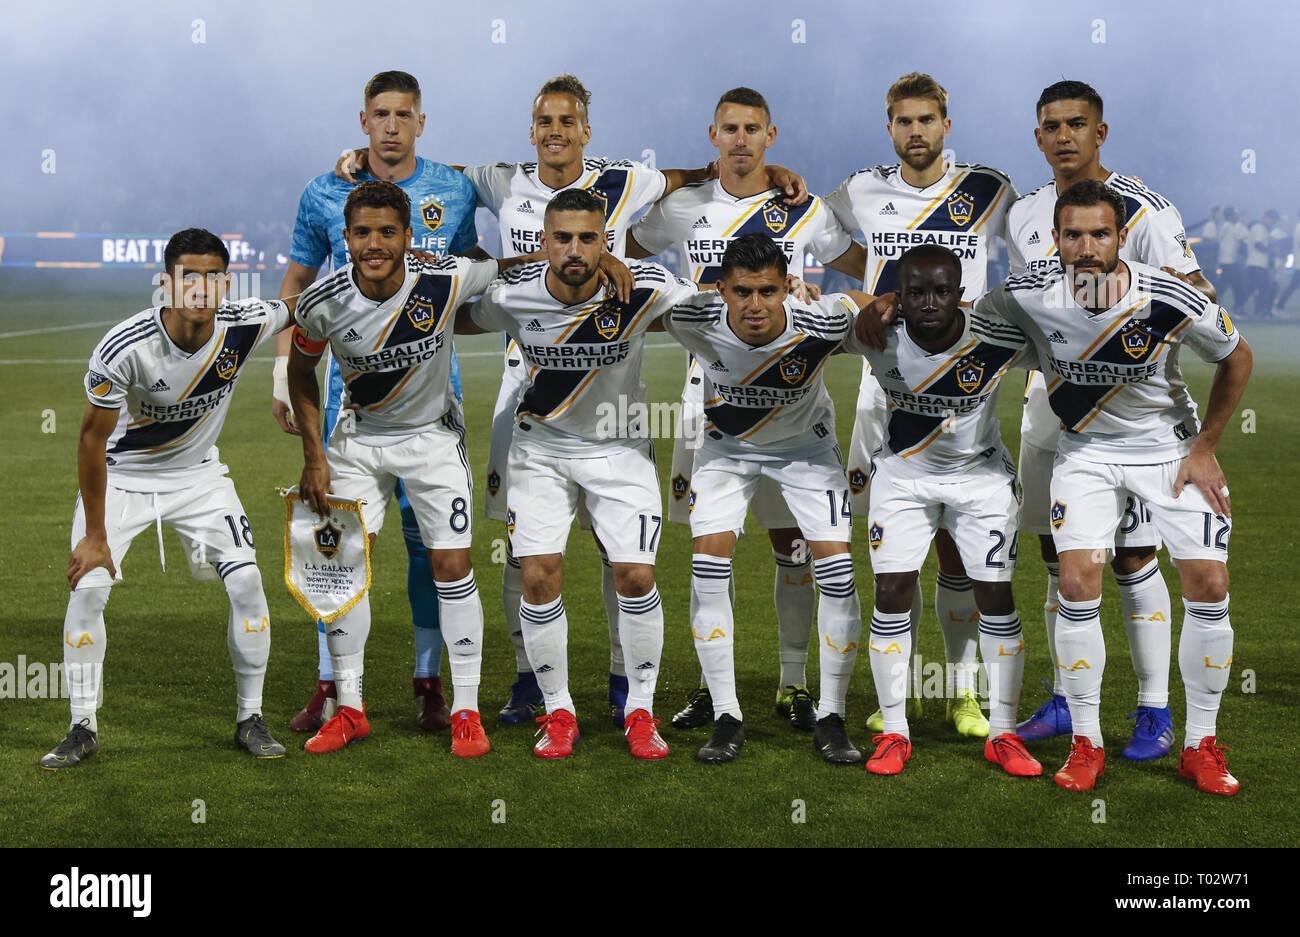 Los Angeles, California, USA  16th Mar, 2019  LA Galaxy team